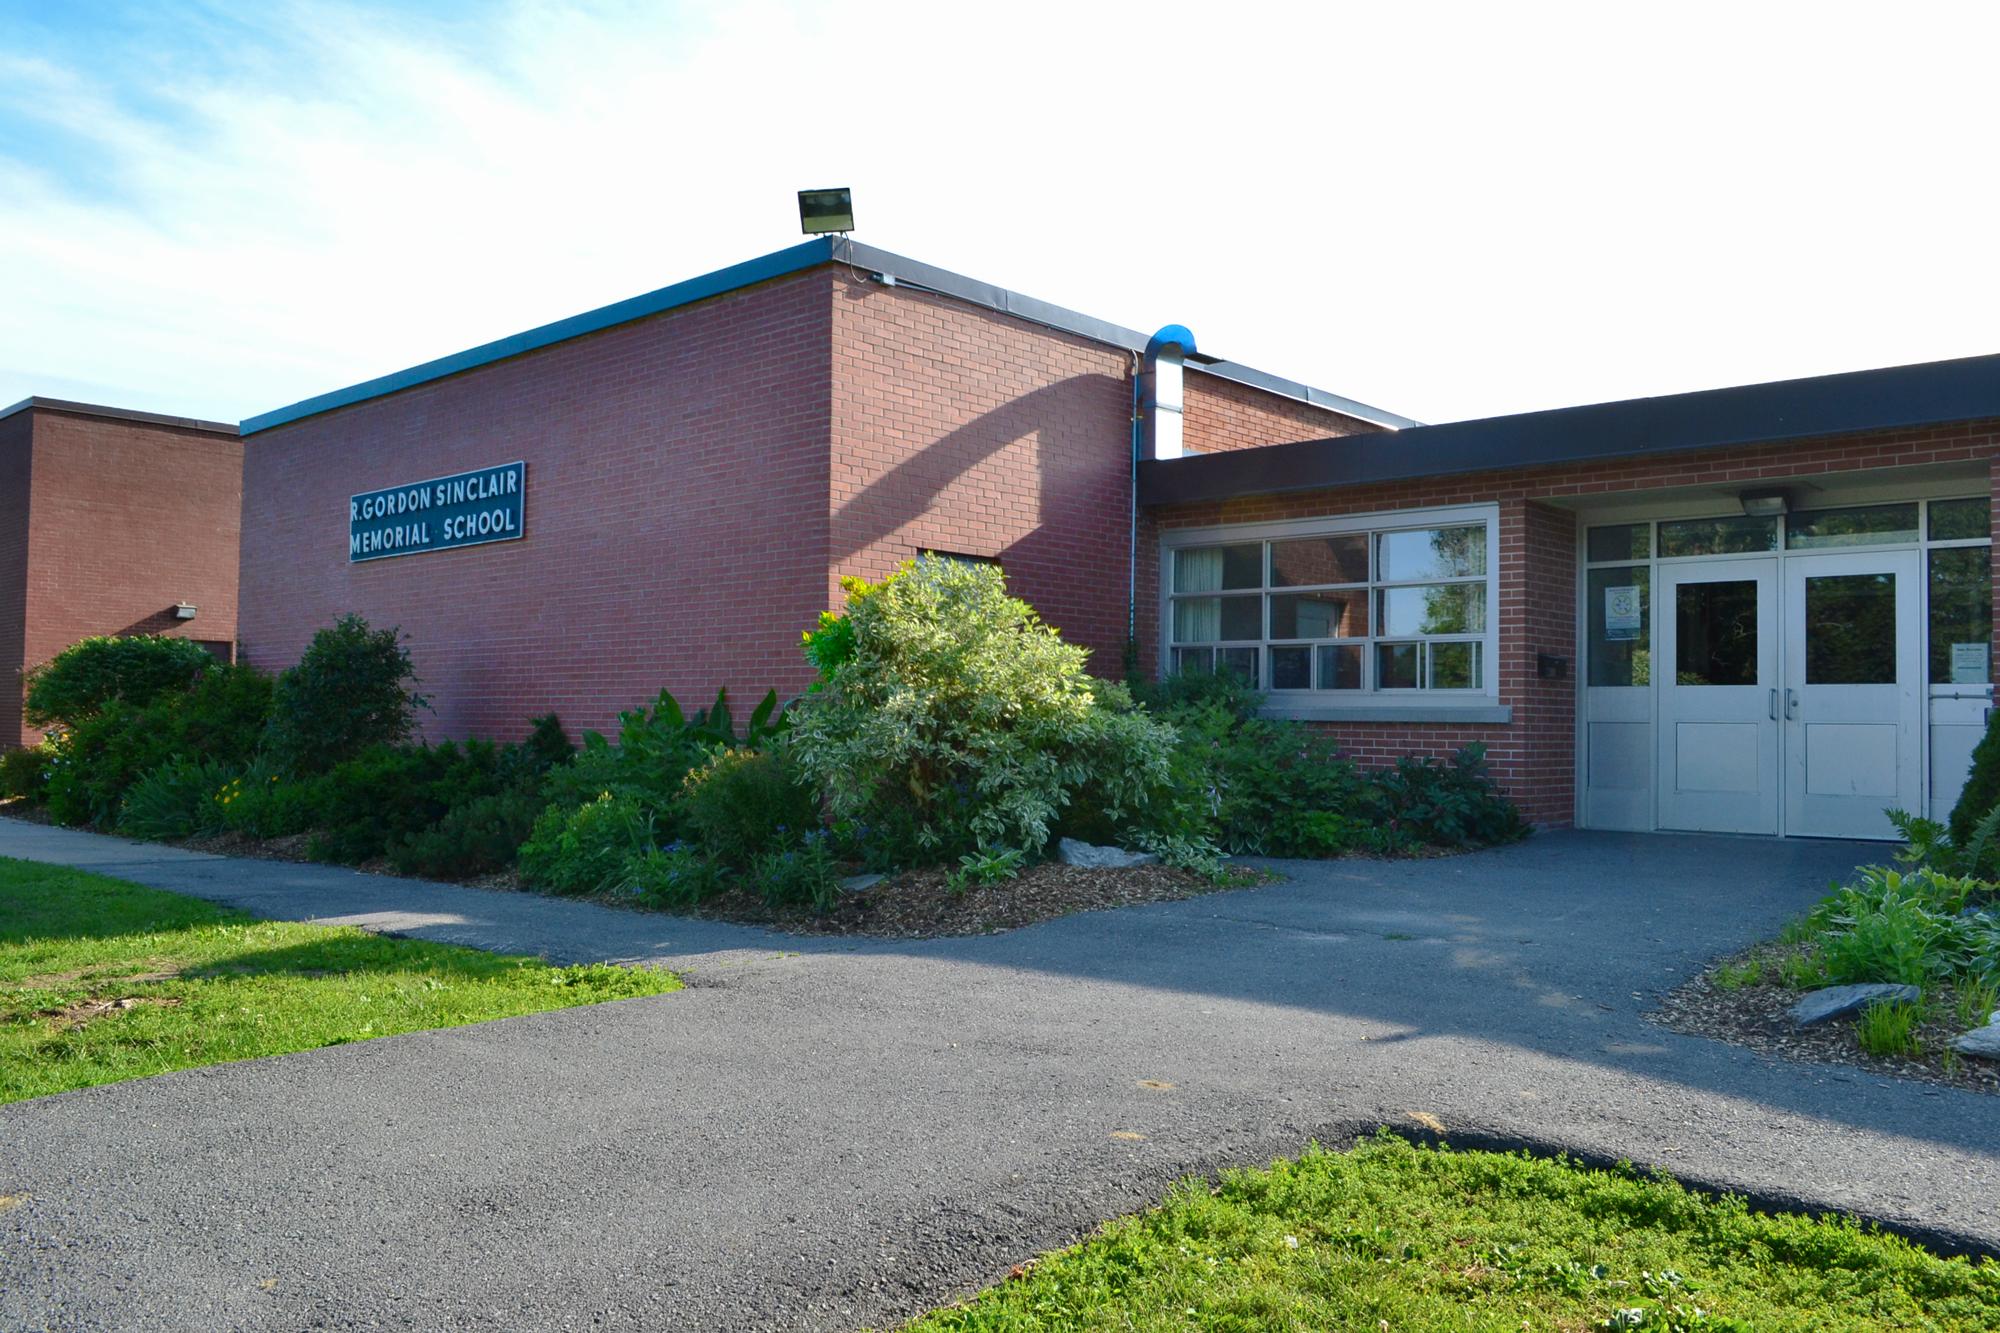 RG SINCLAIR - PUBLIC SCHOOL